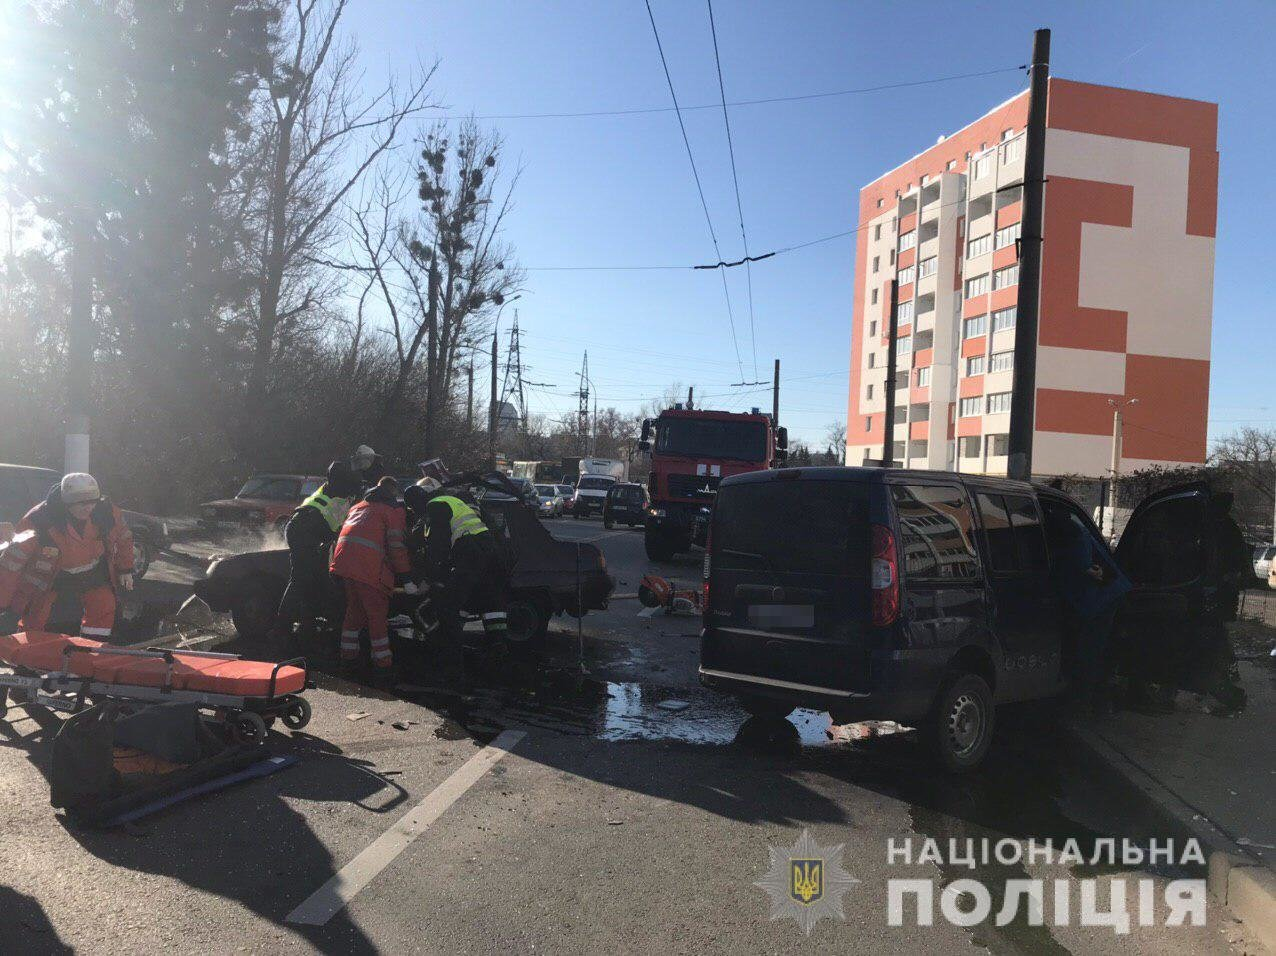 В Харькове пассажирка автомобиля погибла в результате ДТП, - ФОТО, фото-1